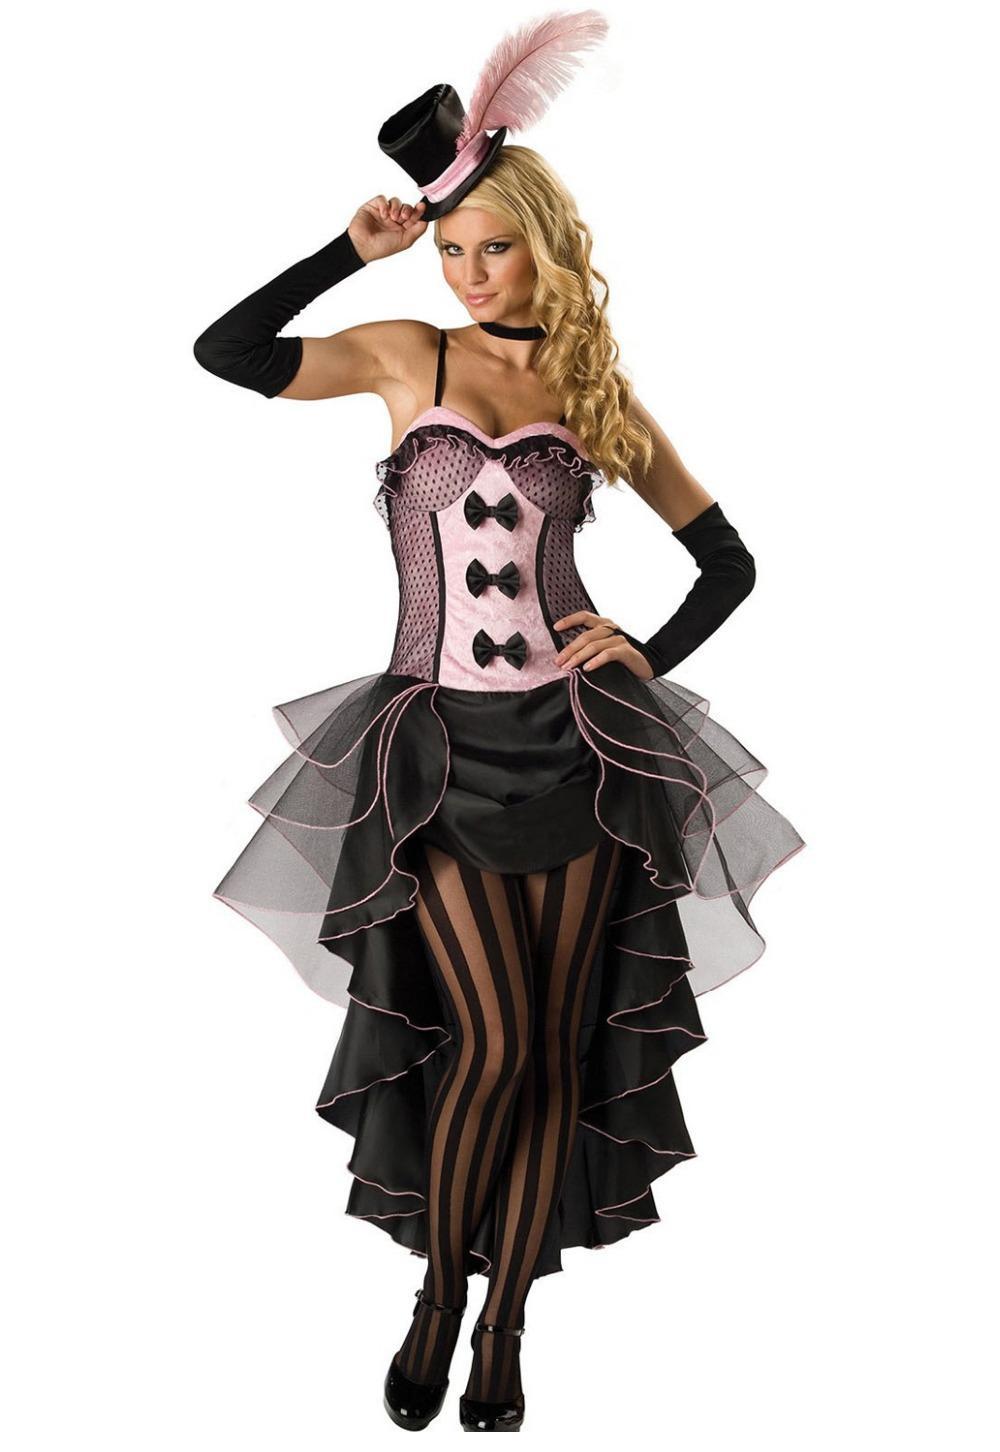 Sexy Halloween costumes Sexy Cosplay Black Pink Burlesque Fancy Dress Costume LC8822 new 2015 women fantasia girl costume(China (Mainland))